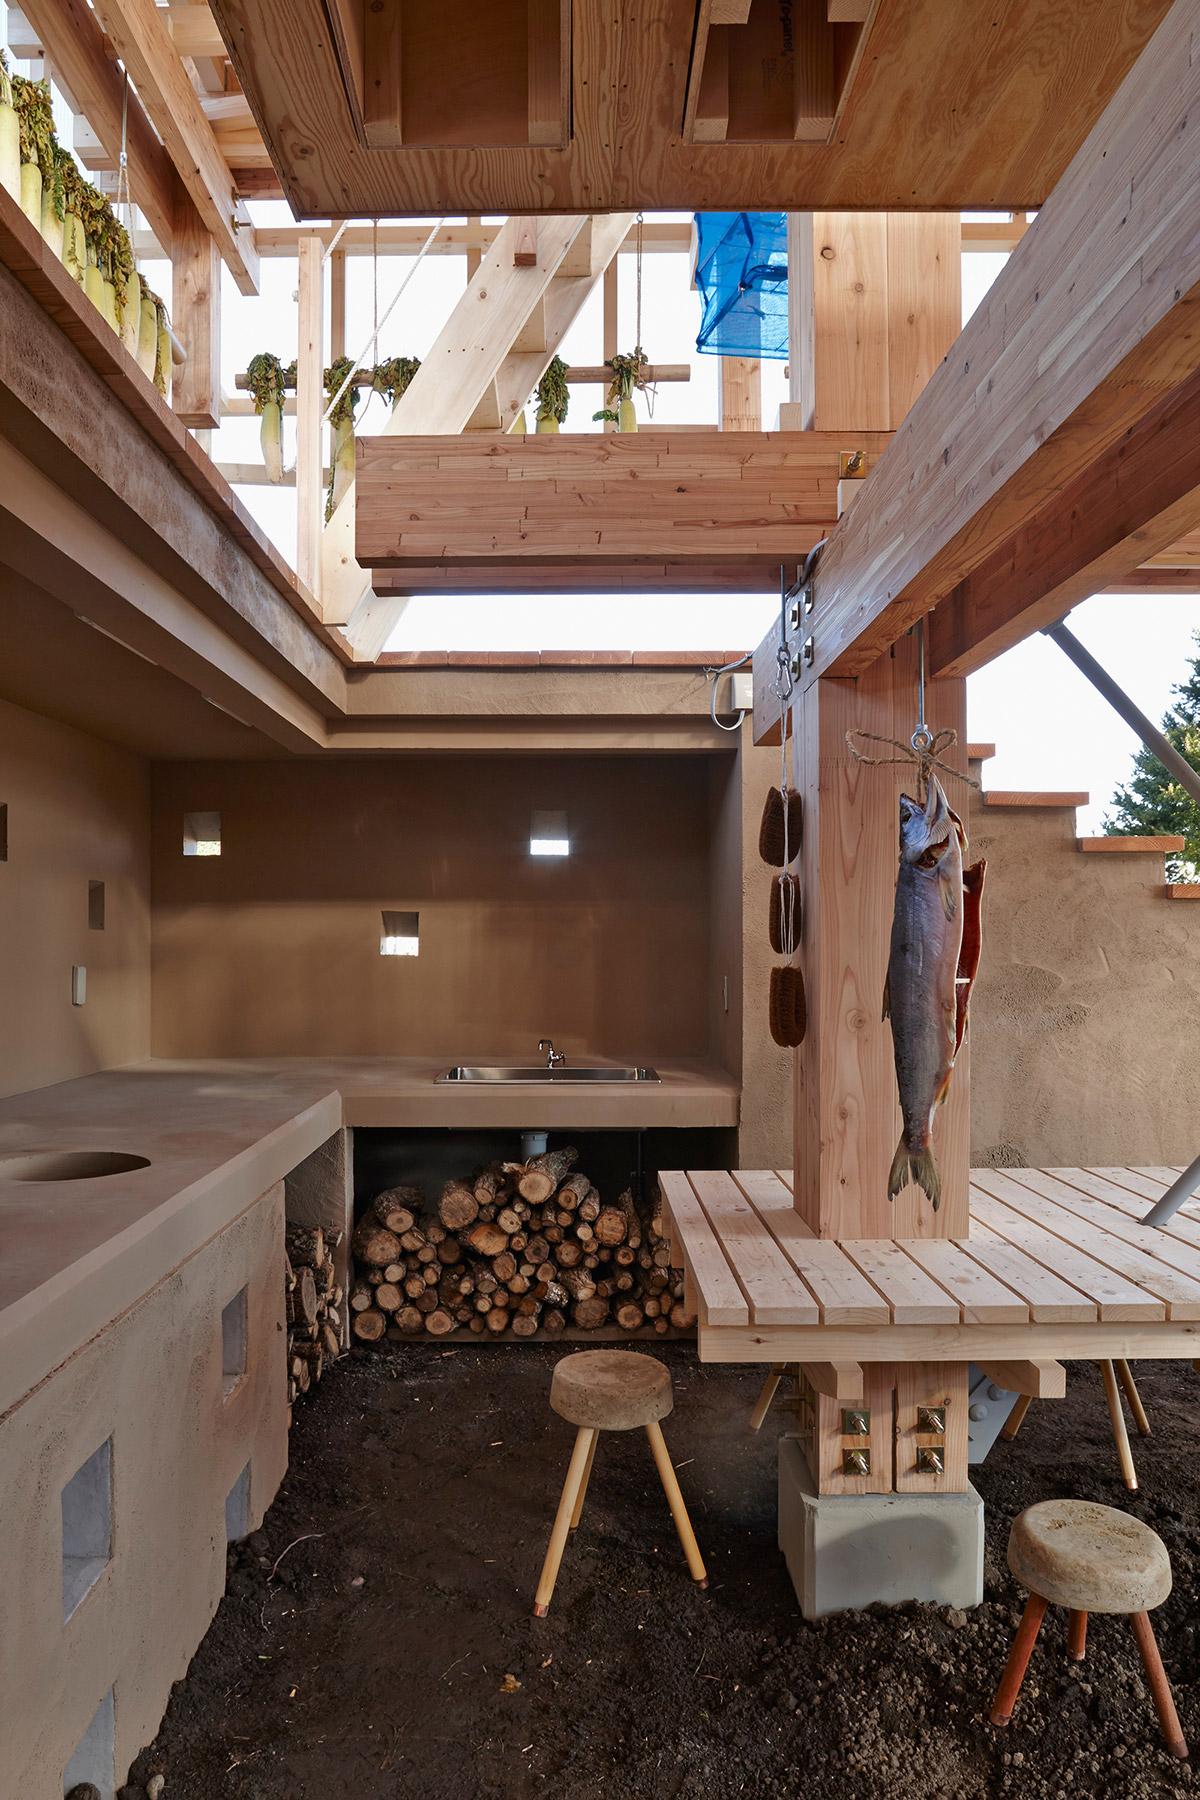 Nest We Grow / College of Environmental Design & Kengo Kuma & Associates (34)